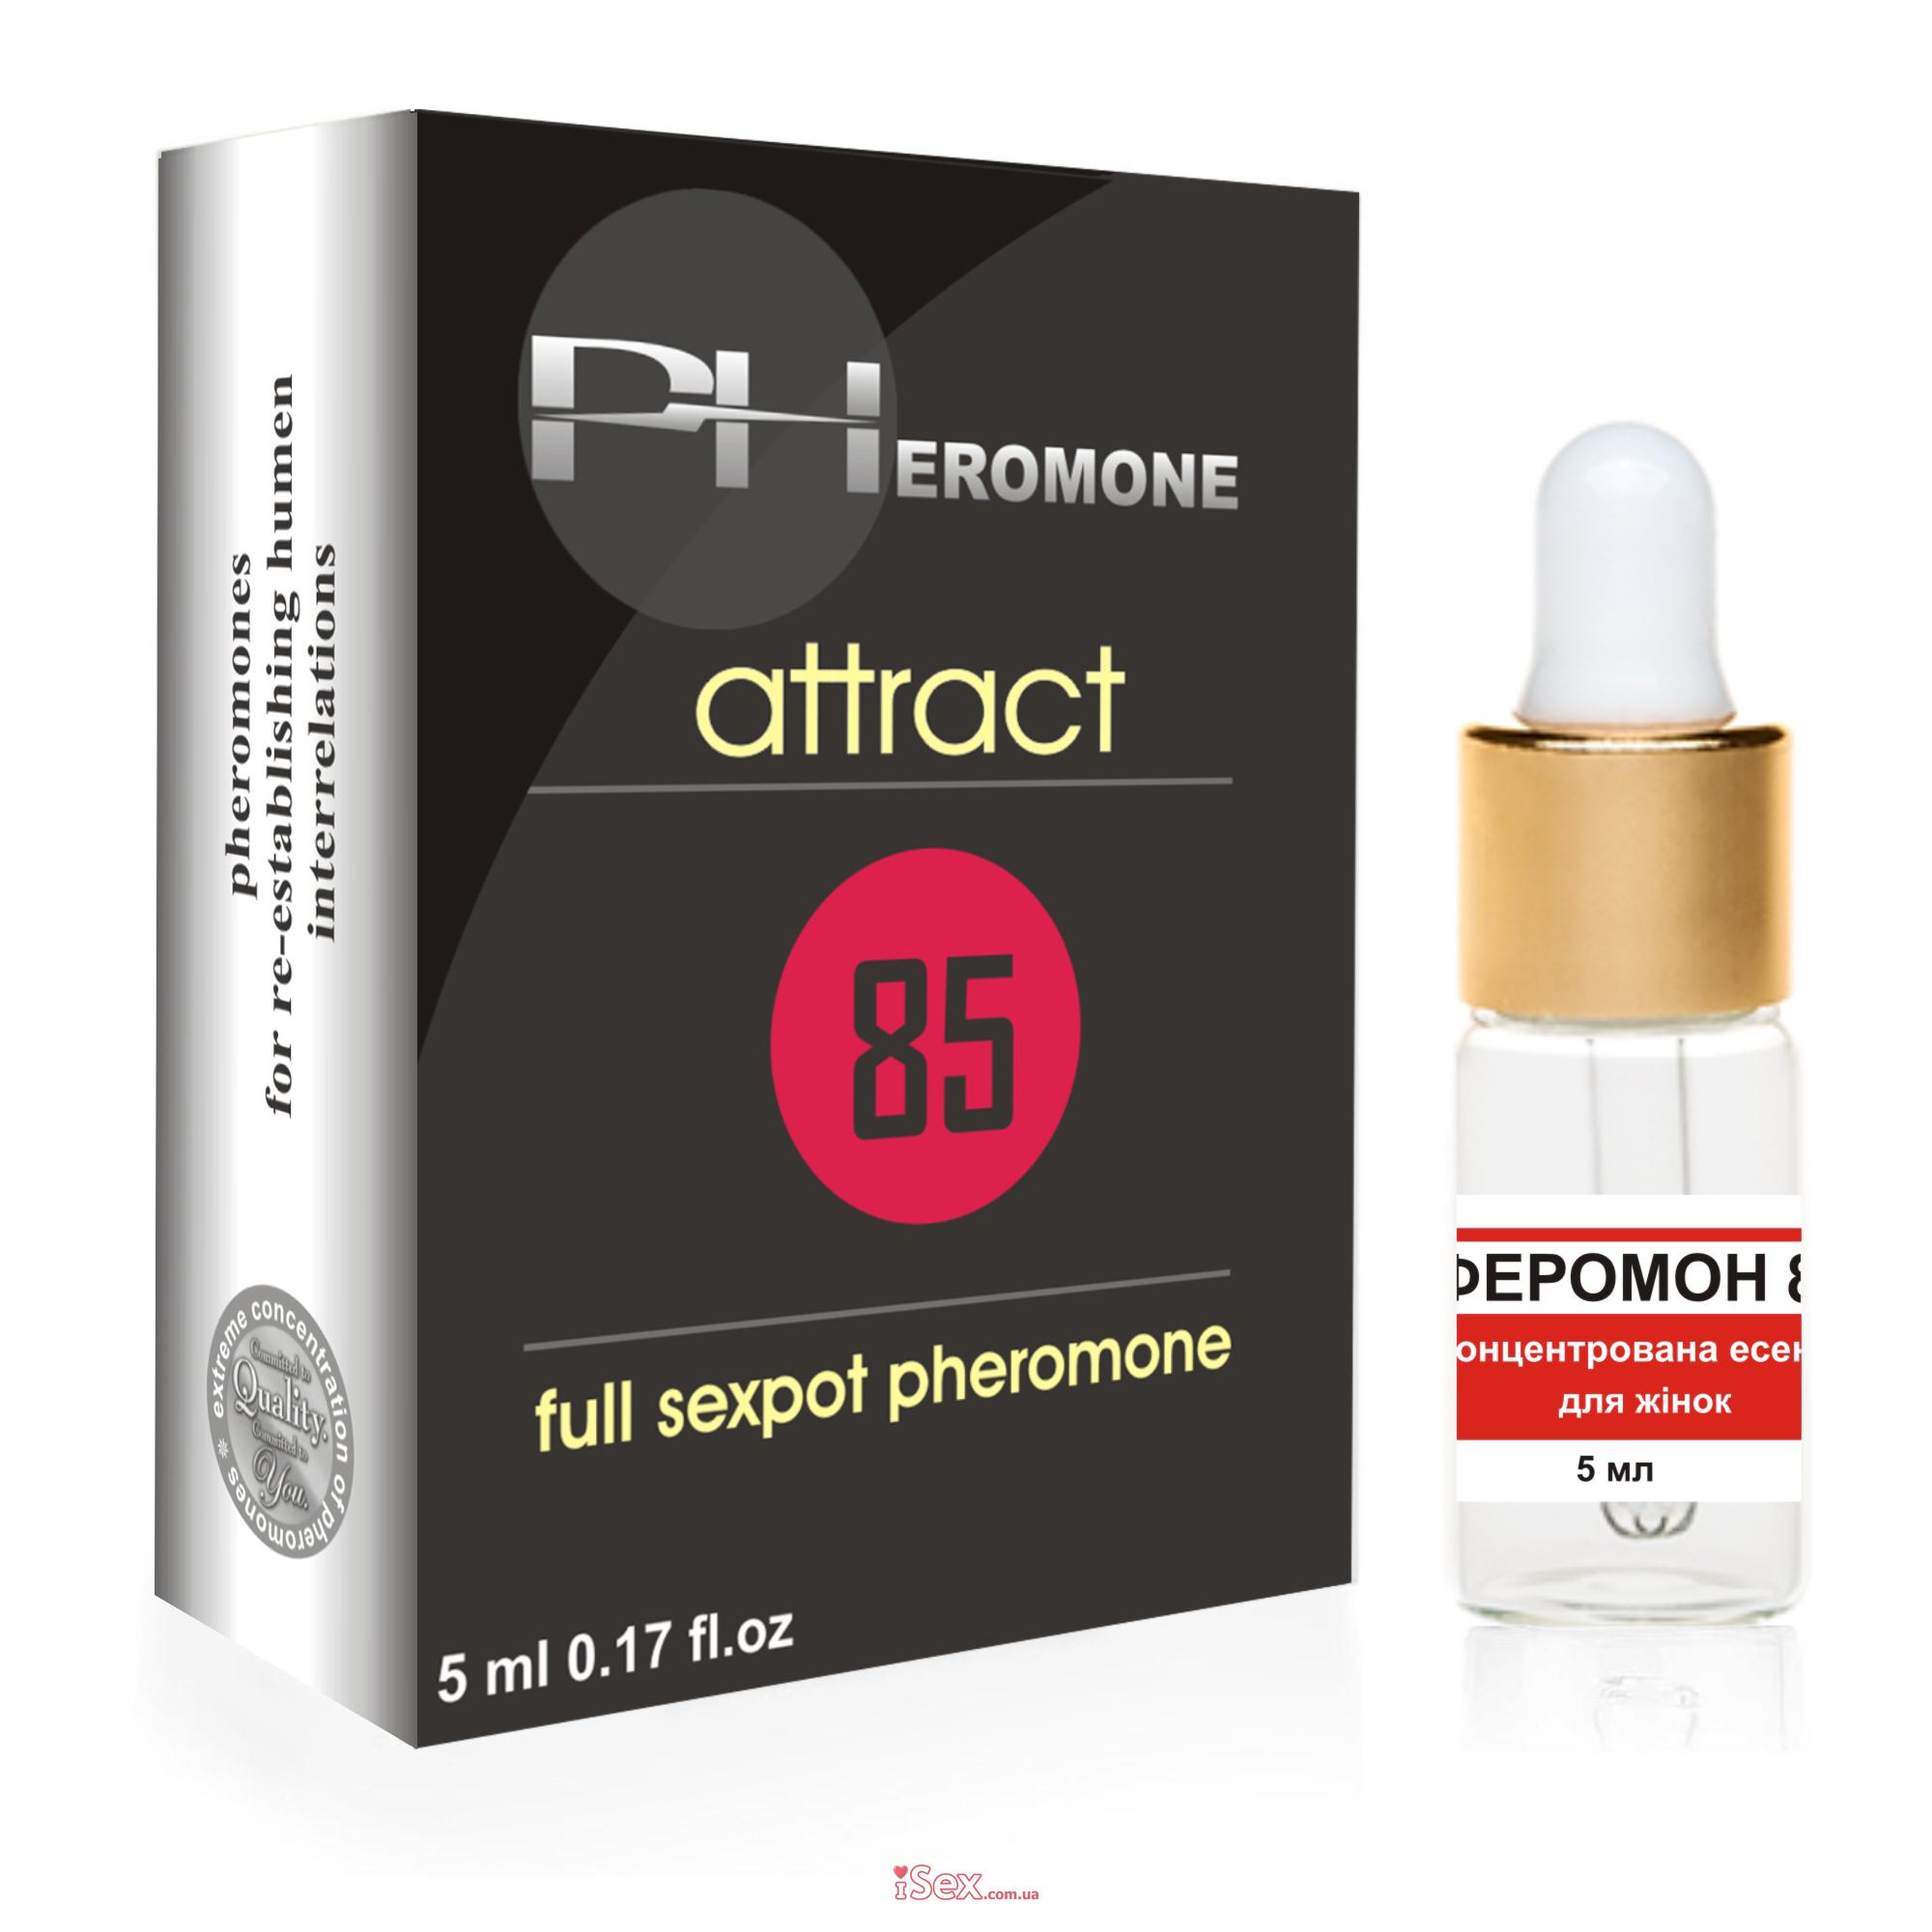 Эссенция женских феромонов PHEROMON 85, 5 мл